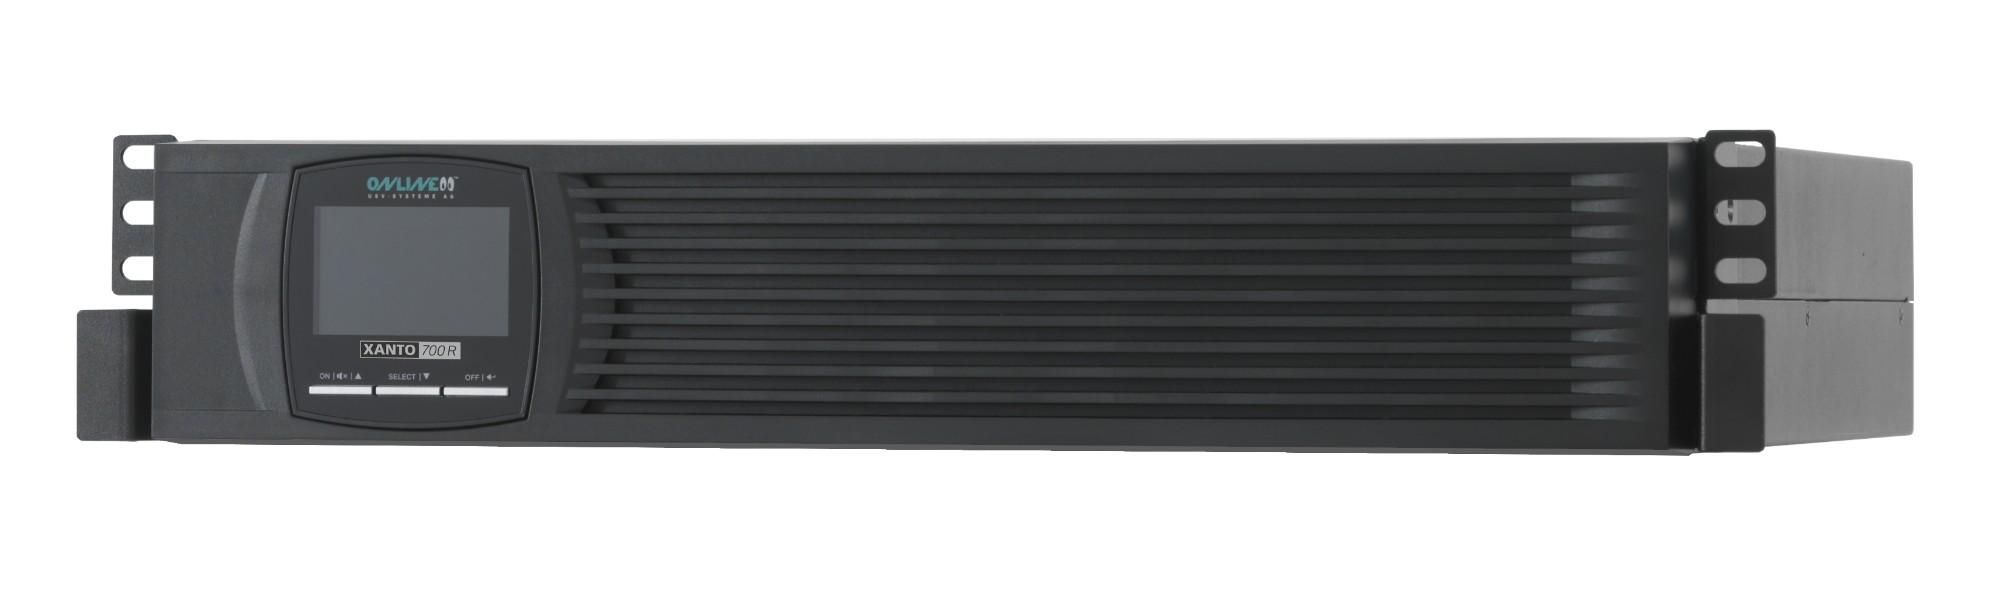 ONLINE USV-Systeme XANTO 700R uninterruptible power supply (UPS) Double-conversion (Online) 700 VA 7